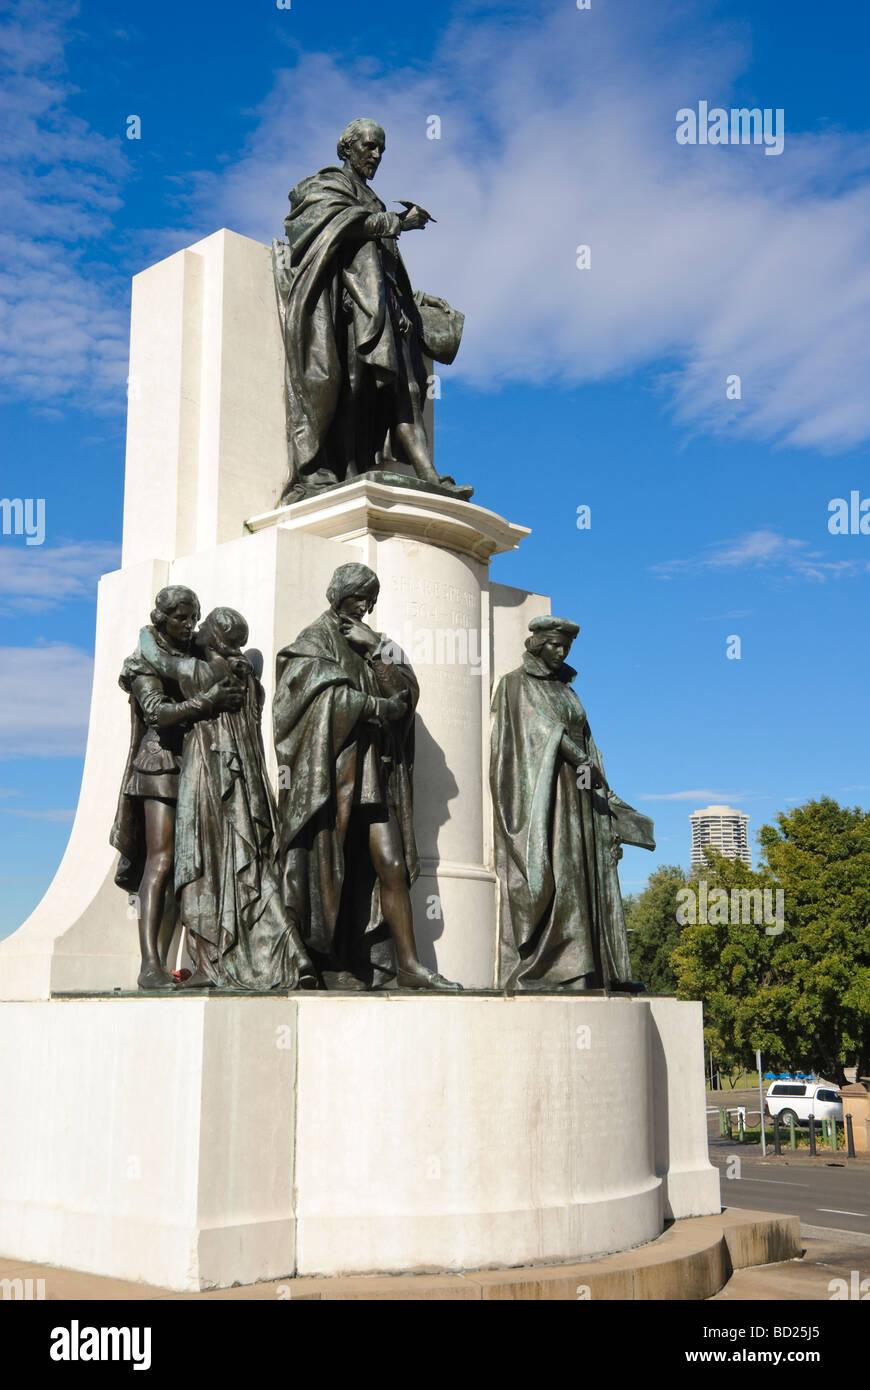 Statues in memorial to Shakespeare. Sydney, Australia. - Stock Image